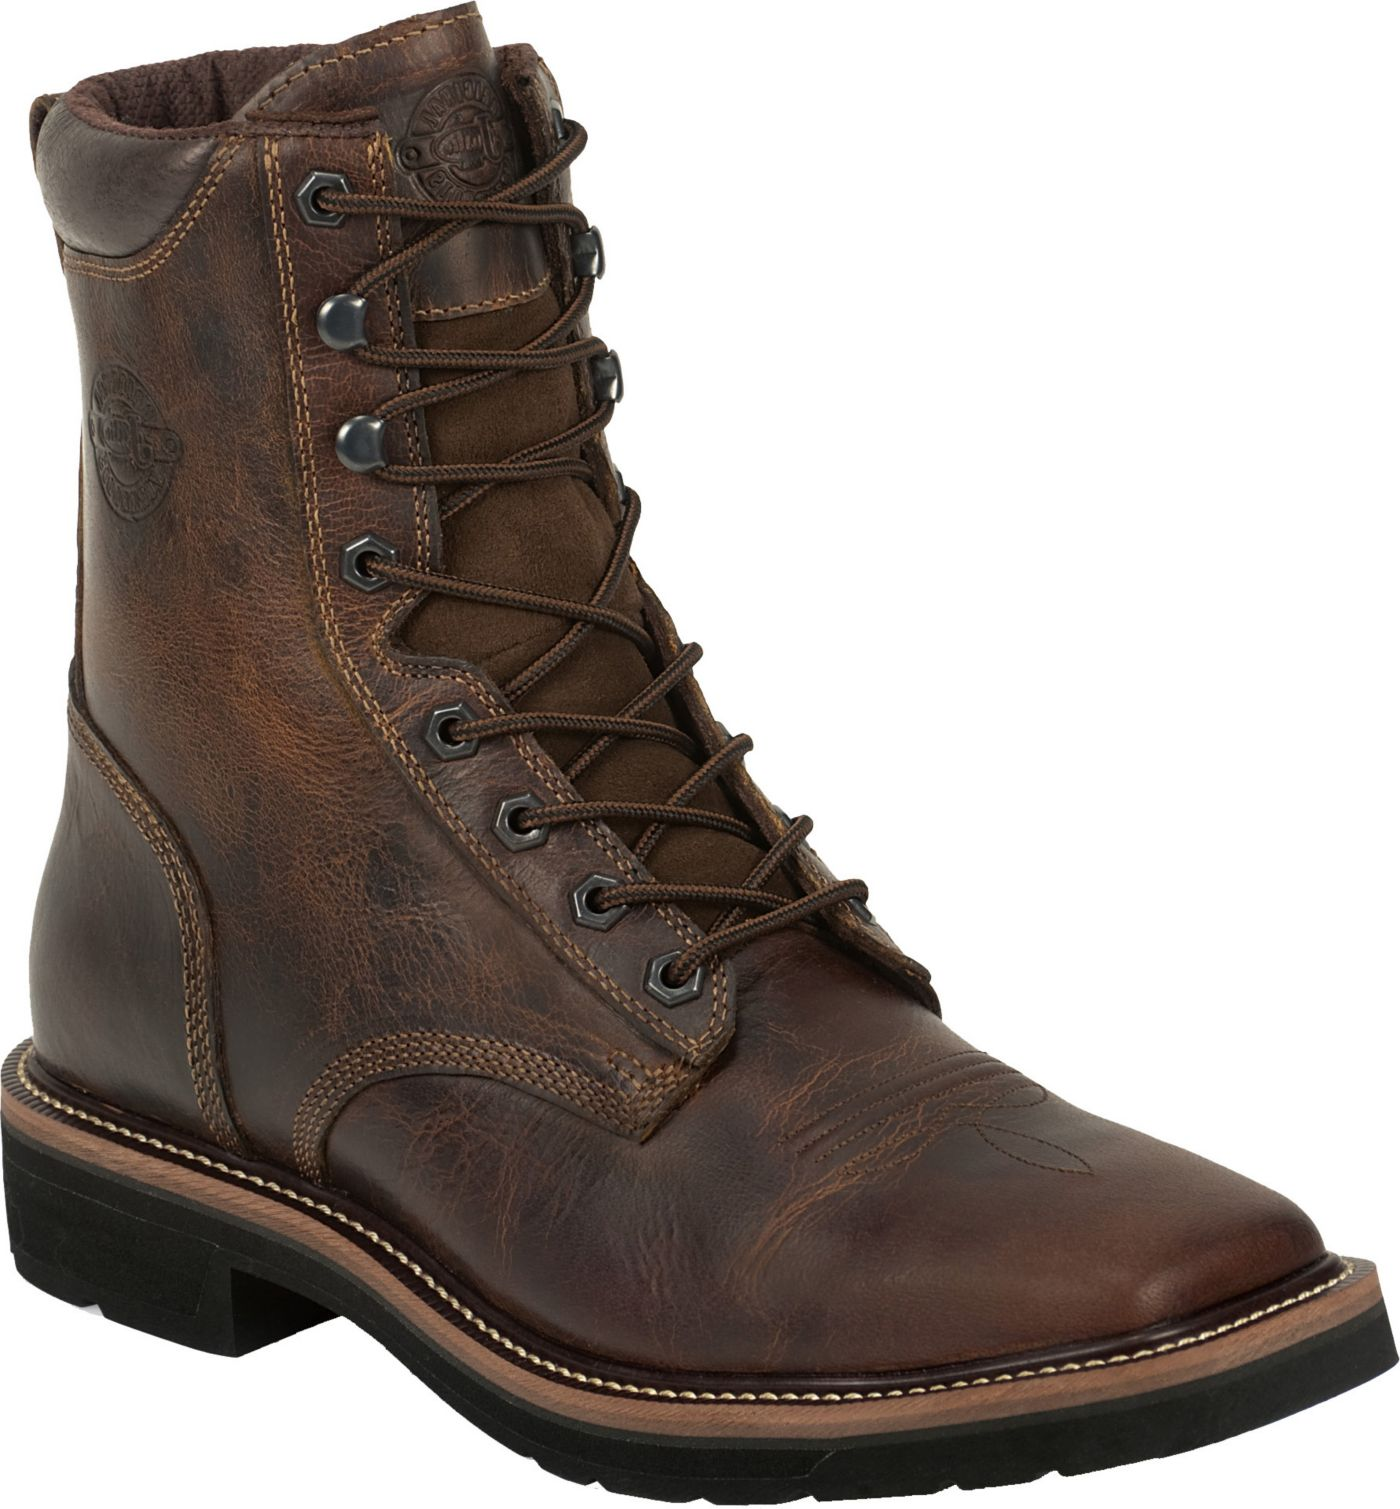 Justin Men S Rugged Tan Stampede Steel Toe Work Boots